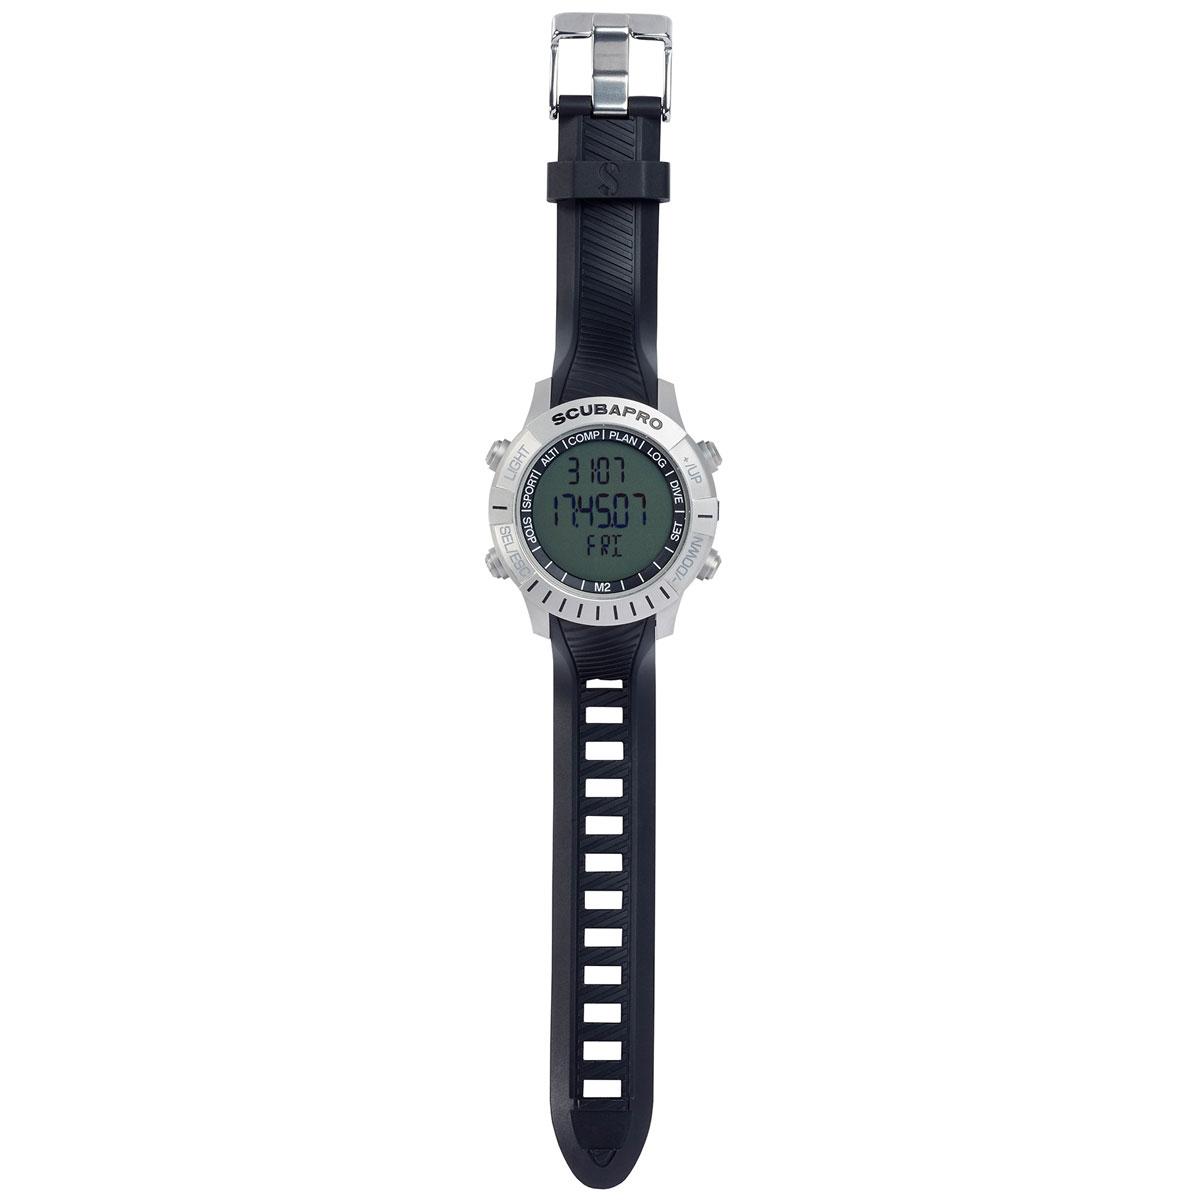 SCUBAPRO - M2 Armband schwarz